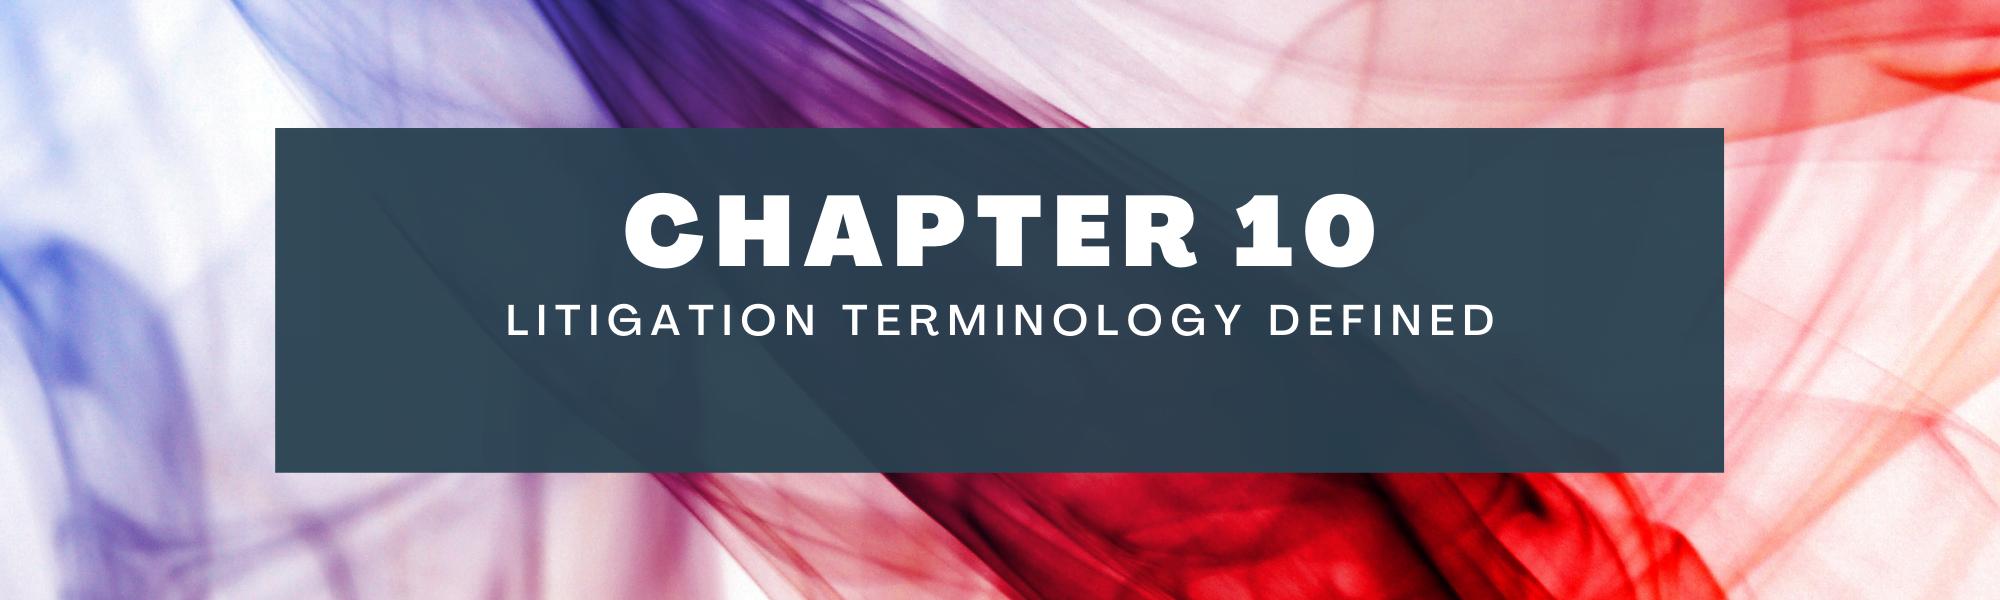 Litigation terminology